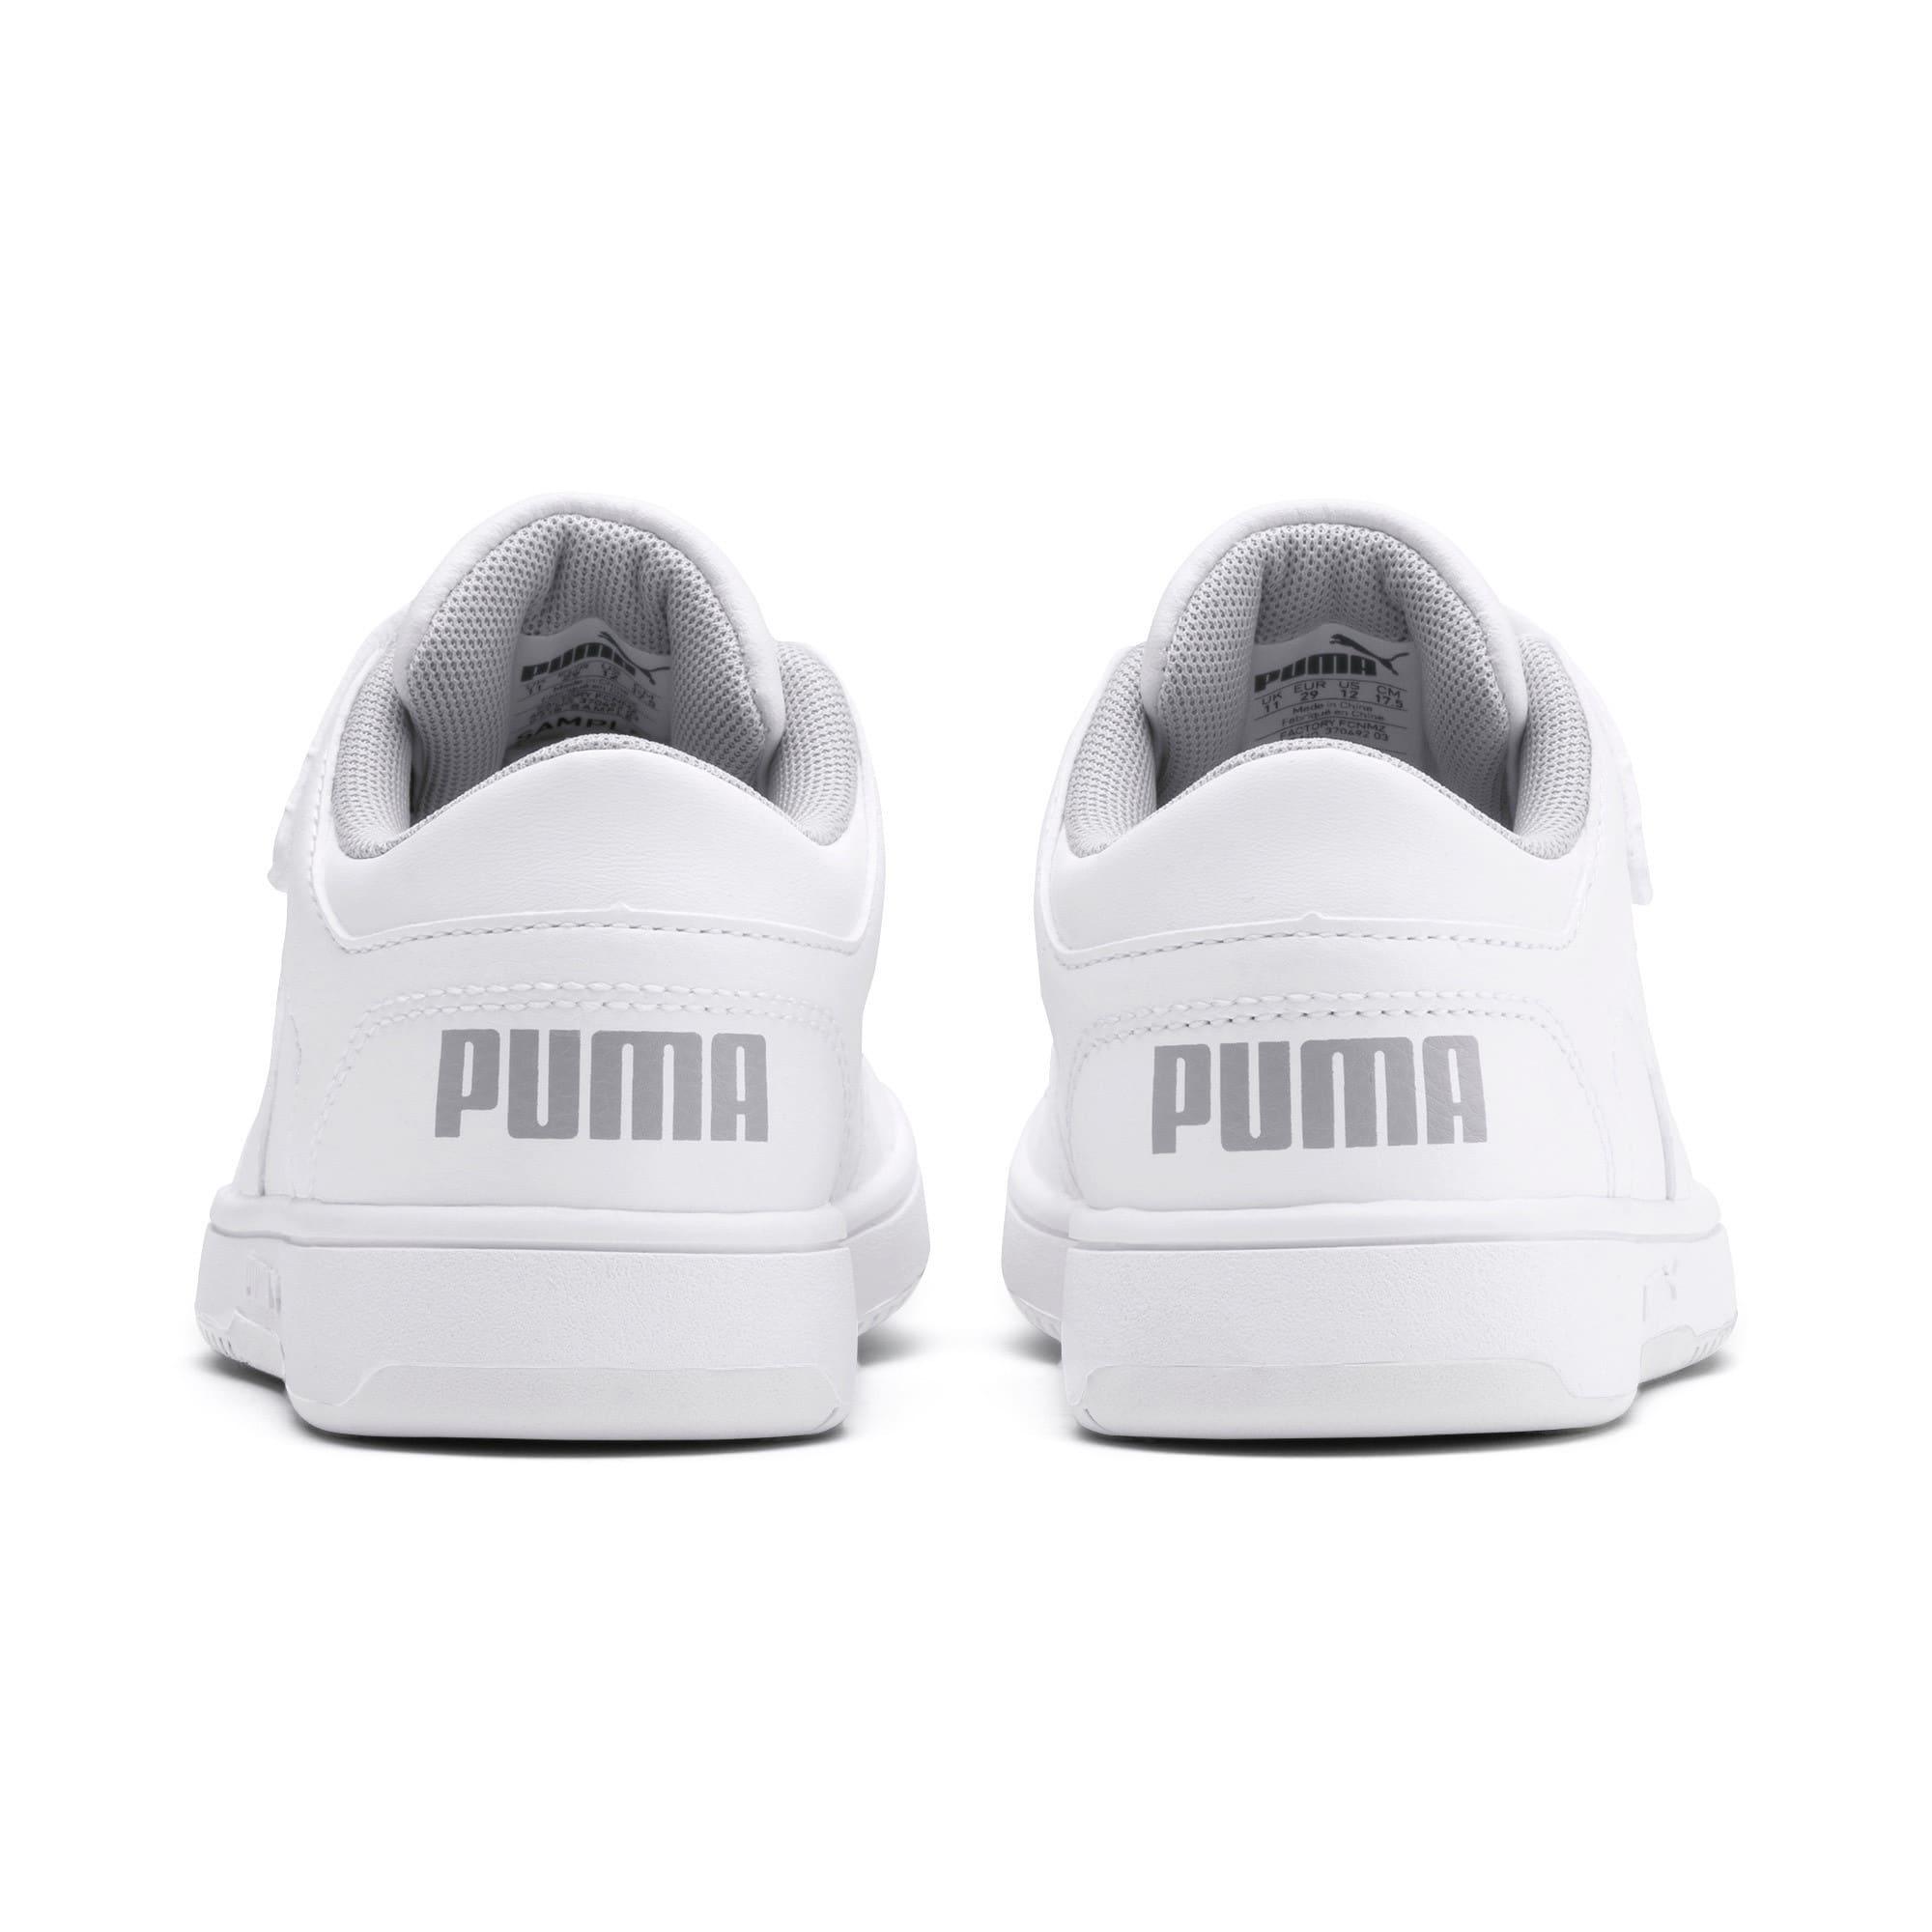 Thumbnail 3 of PUMA Rebound LayUp Lo Little Kids' Shoes, Puma White-High Rise, medium